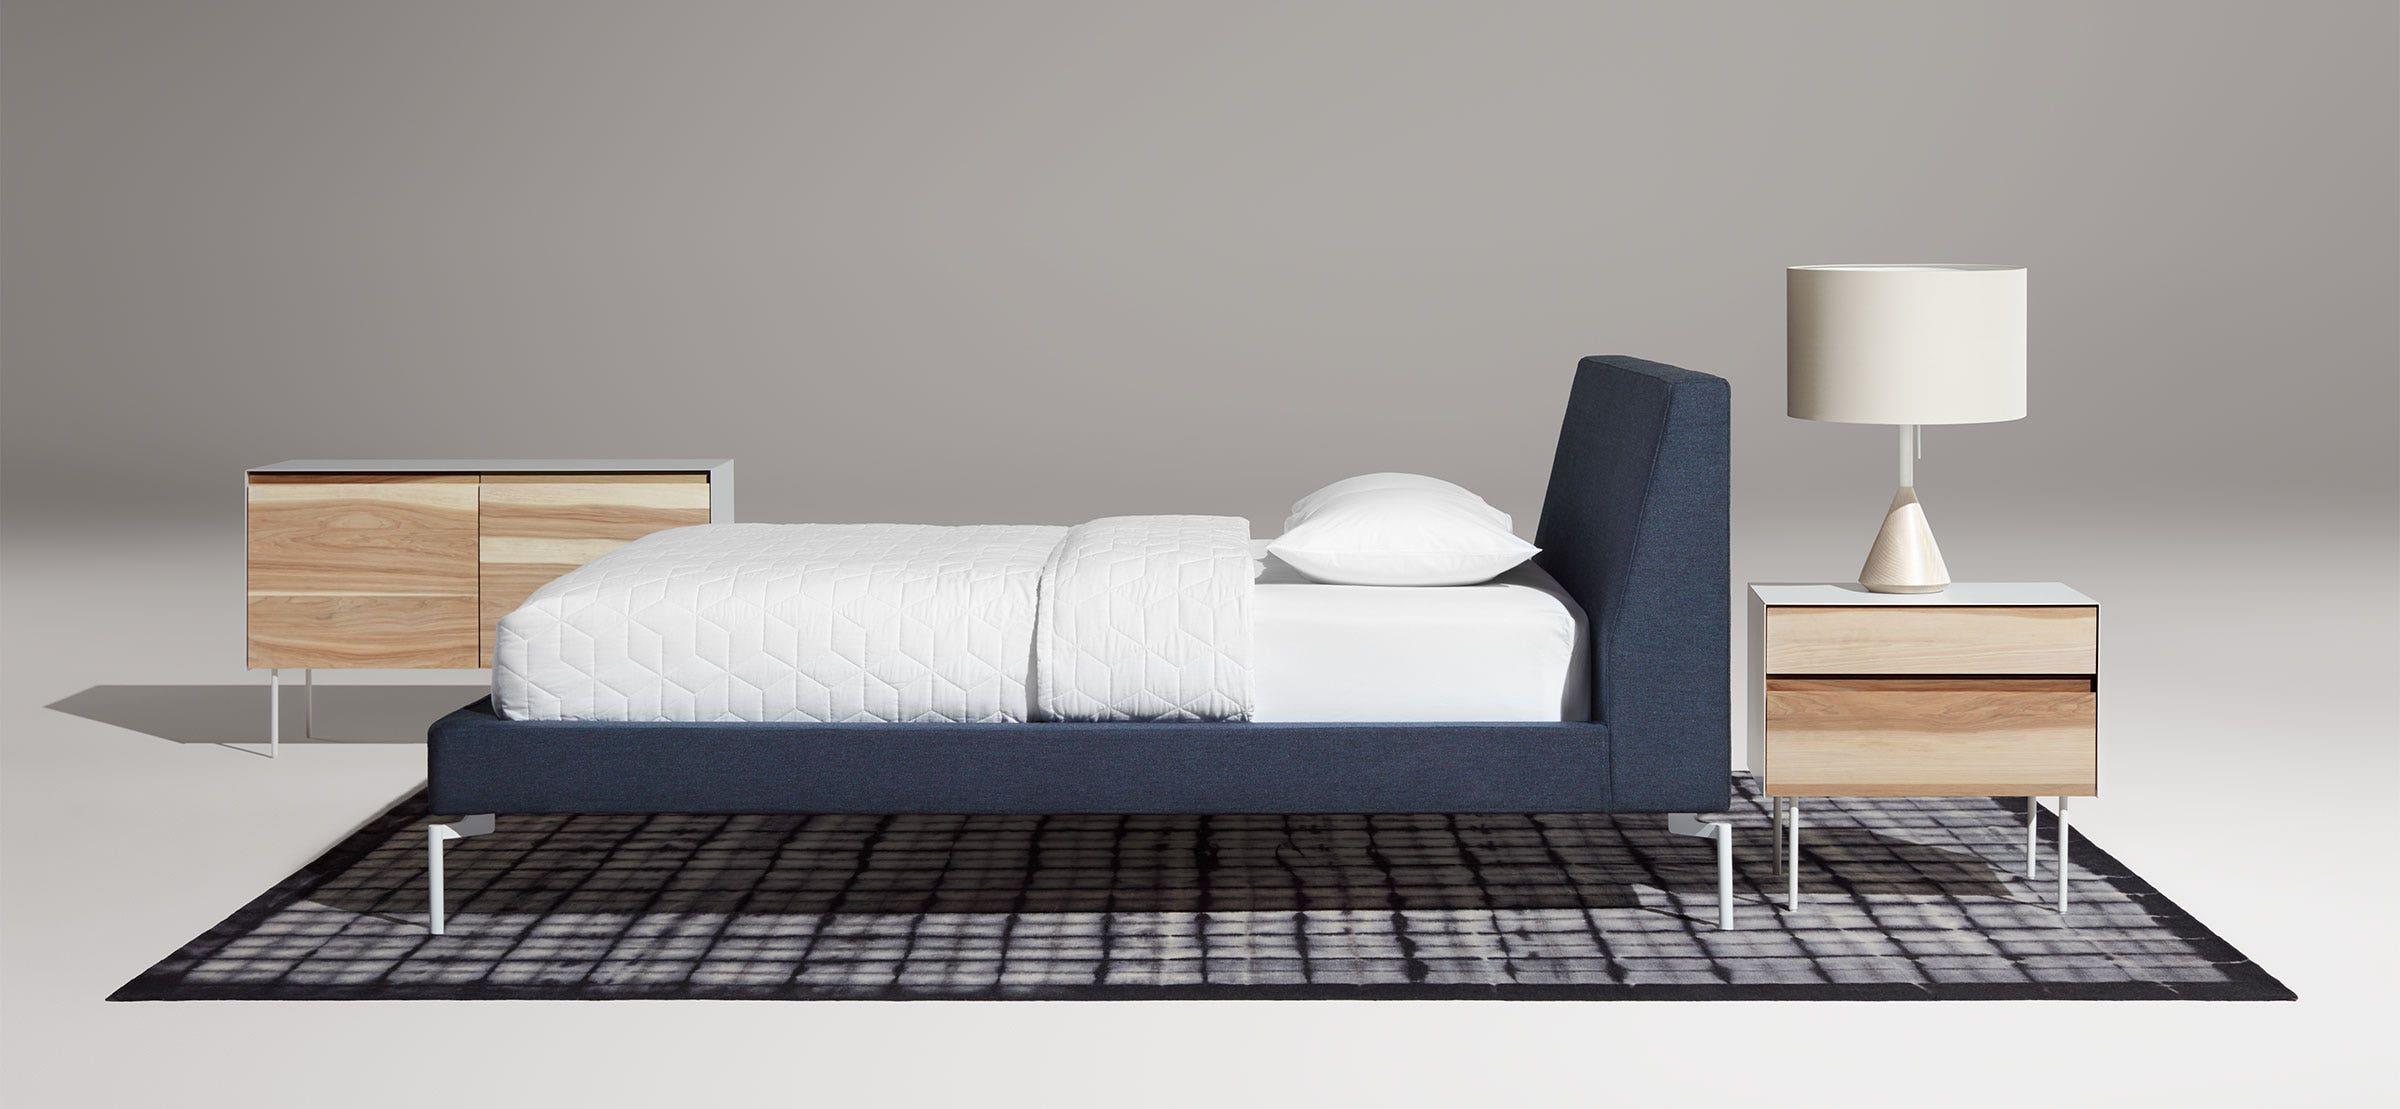 New Standard Queen Bed - Upholstered Bed Frame | Blu Dot